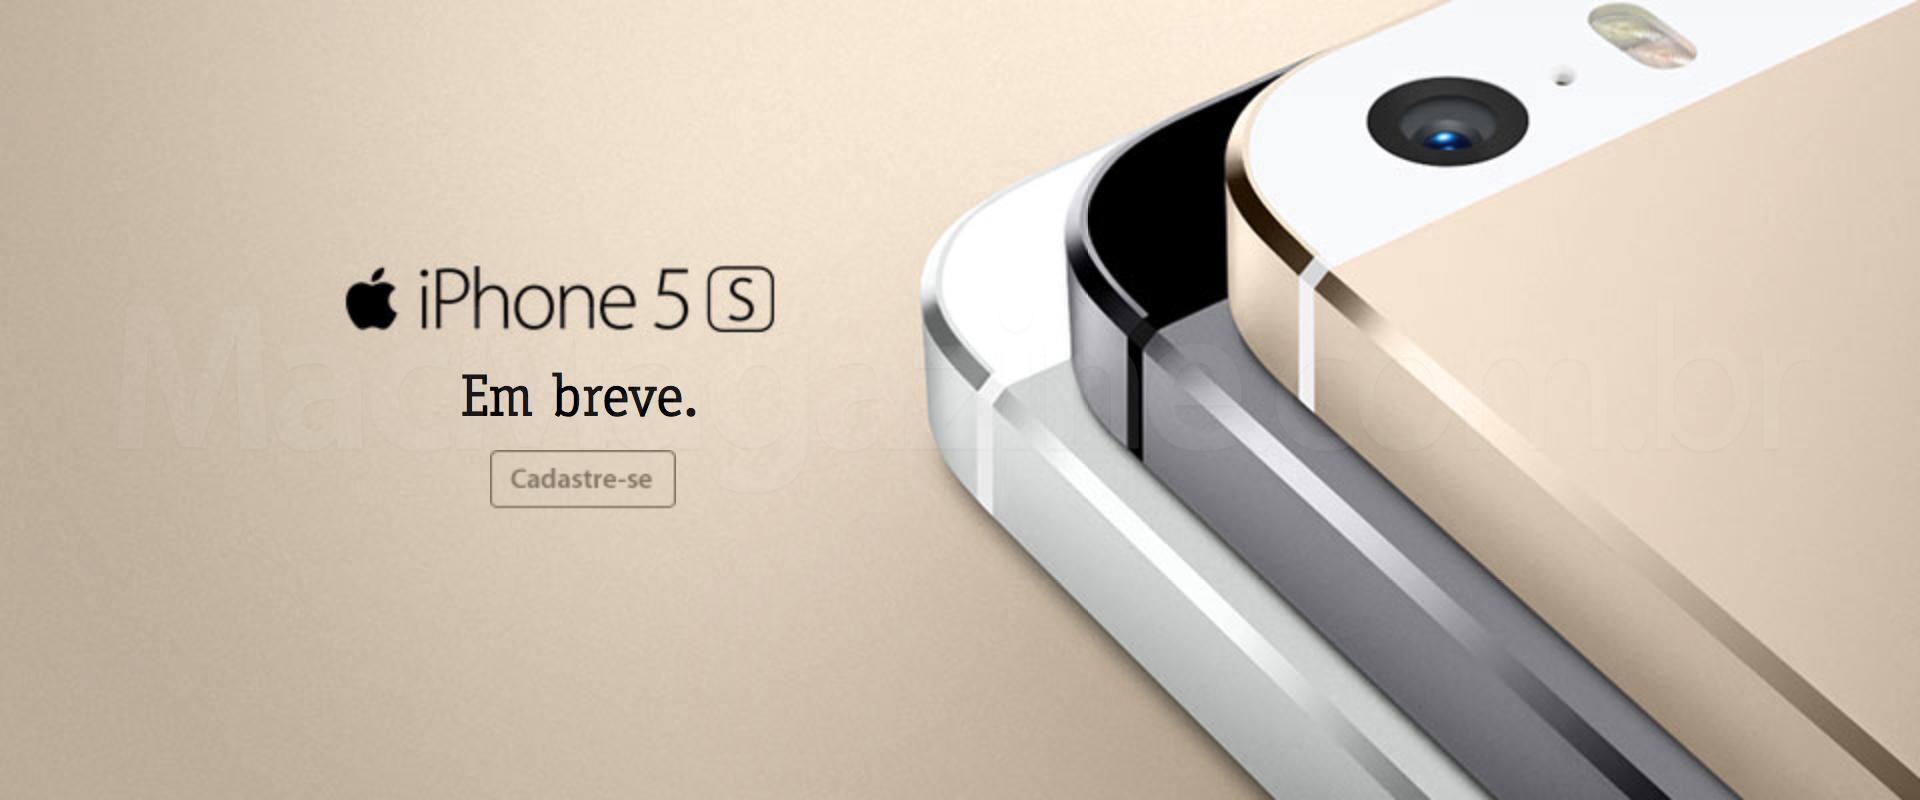 iPhone 5s na Vivo